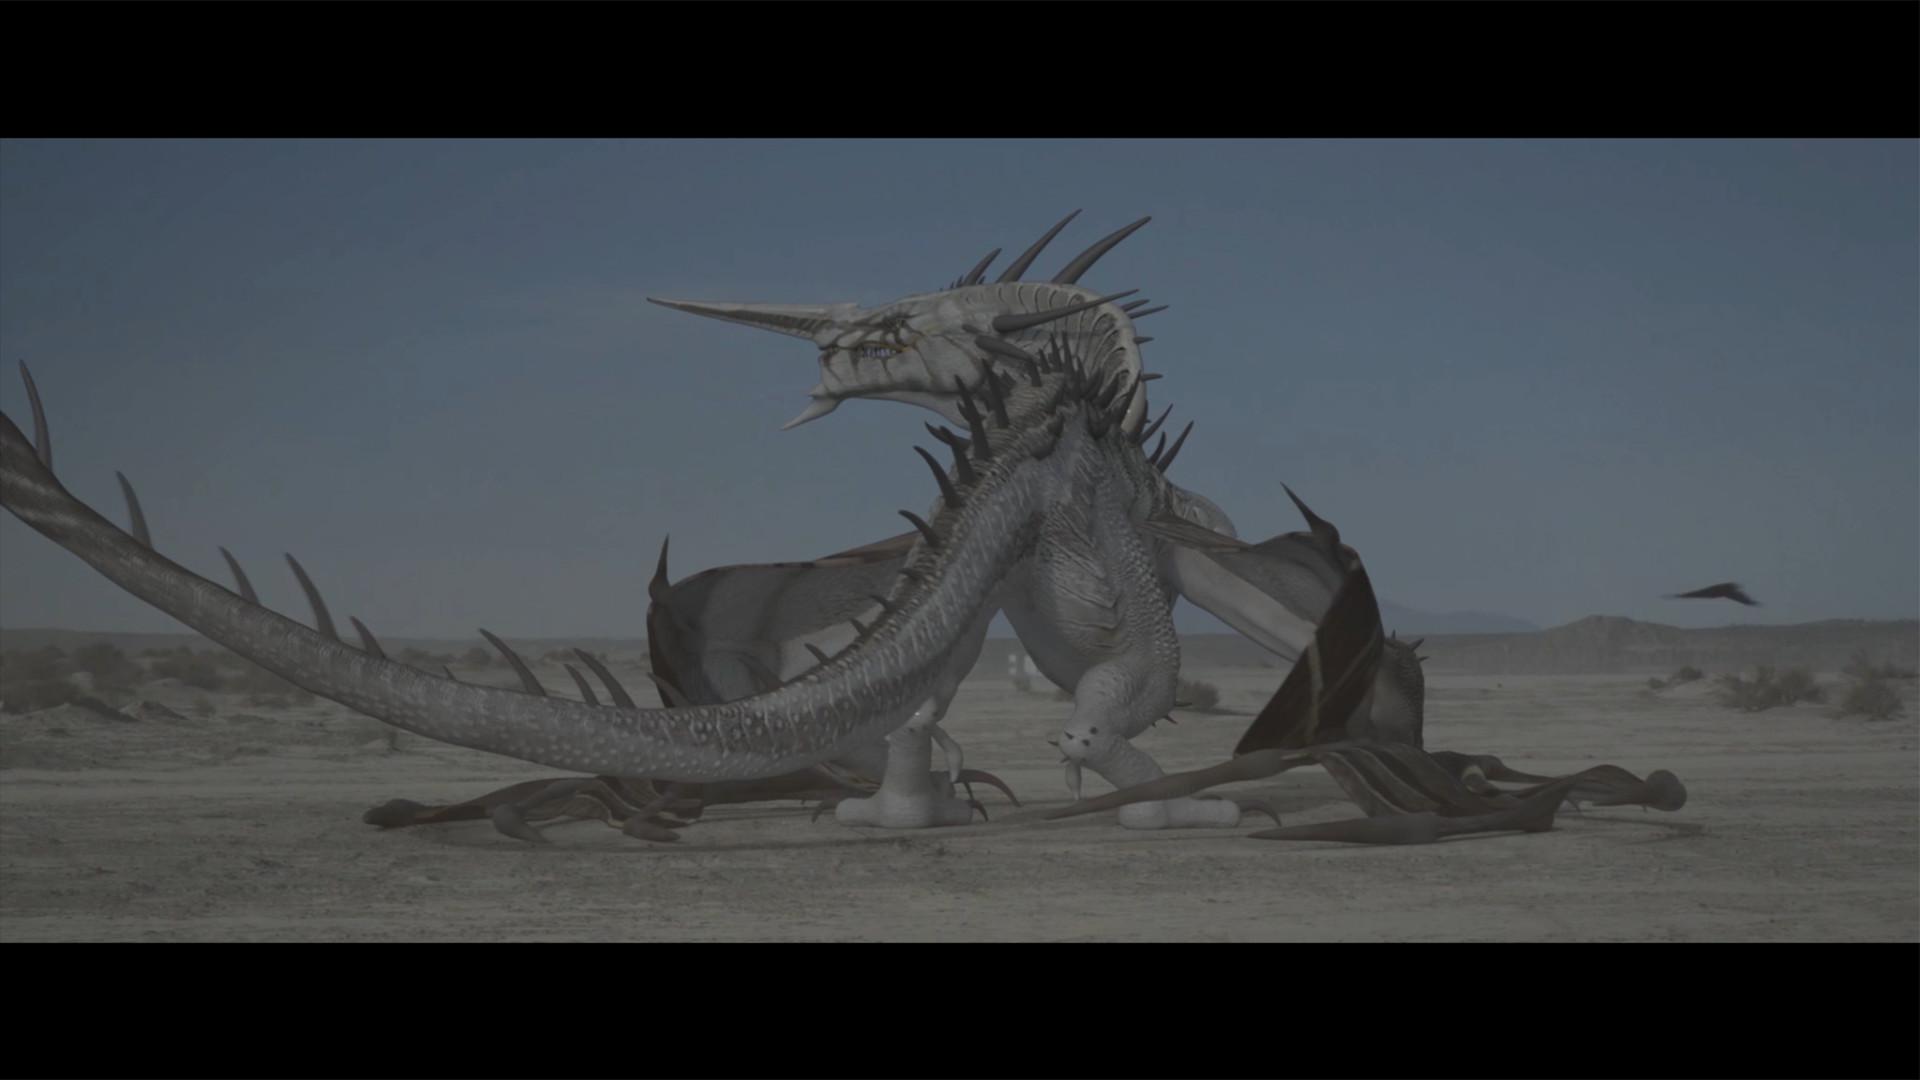 Alexandra reeves lexir elliotwaters creature5 matchmoving